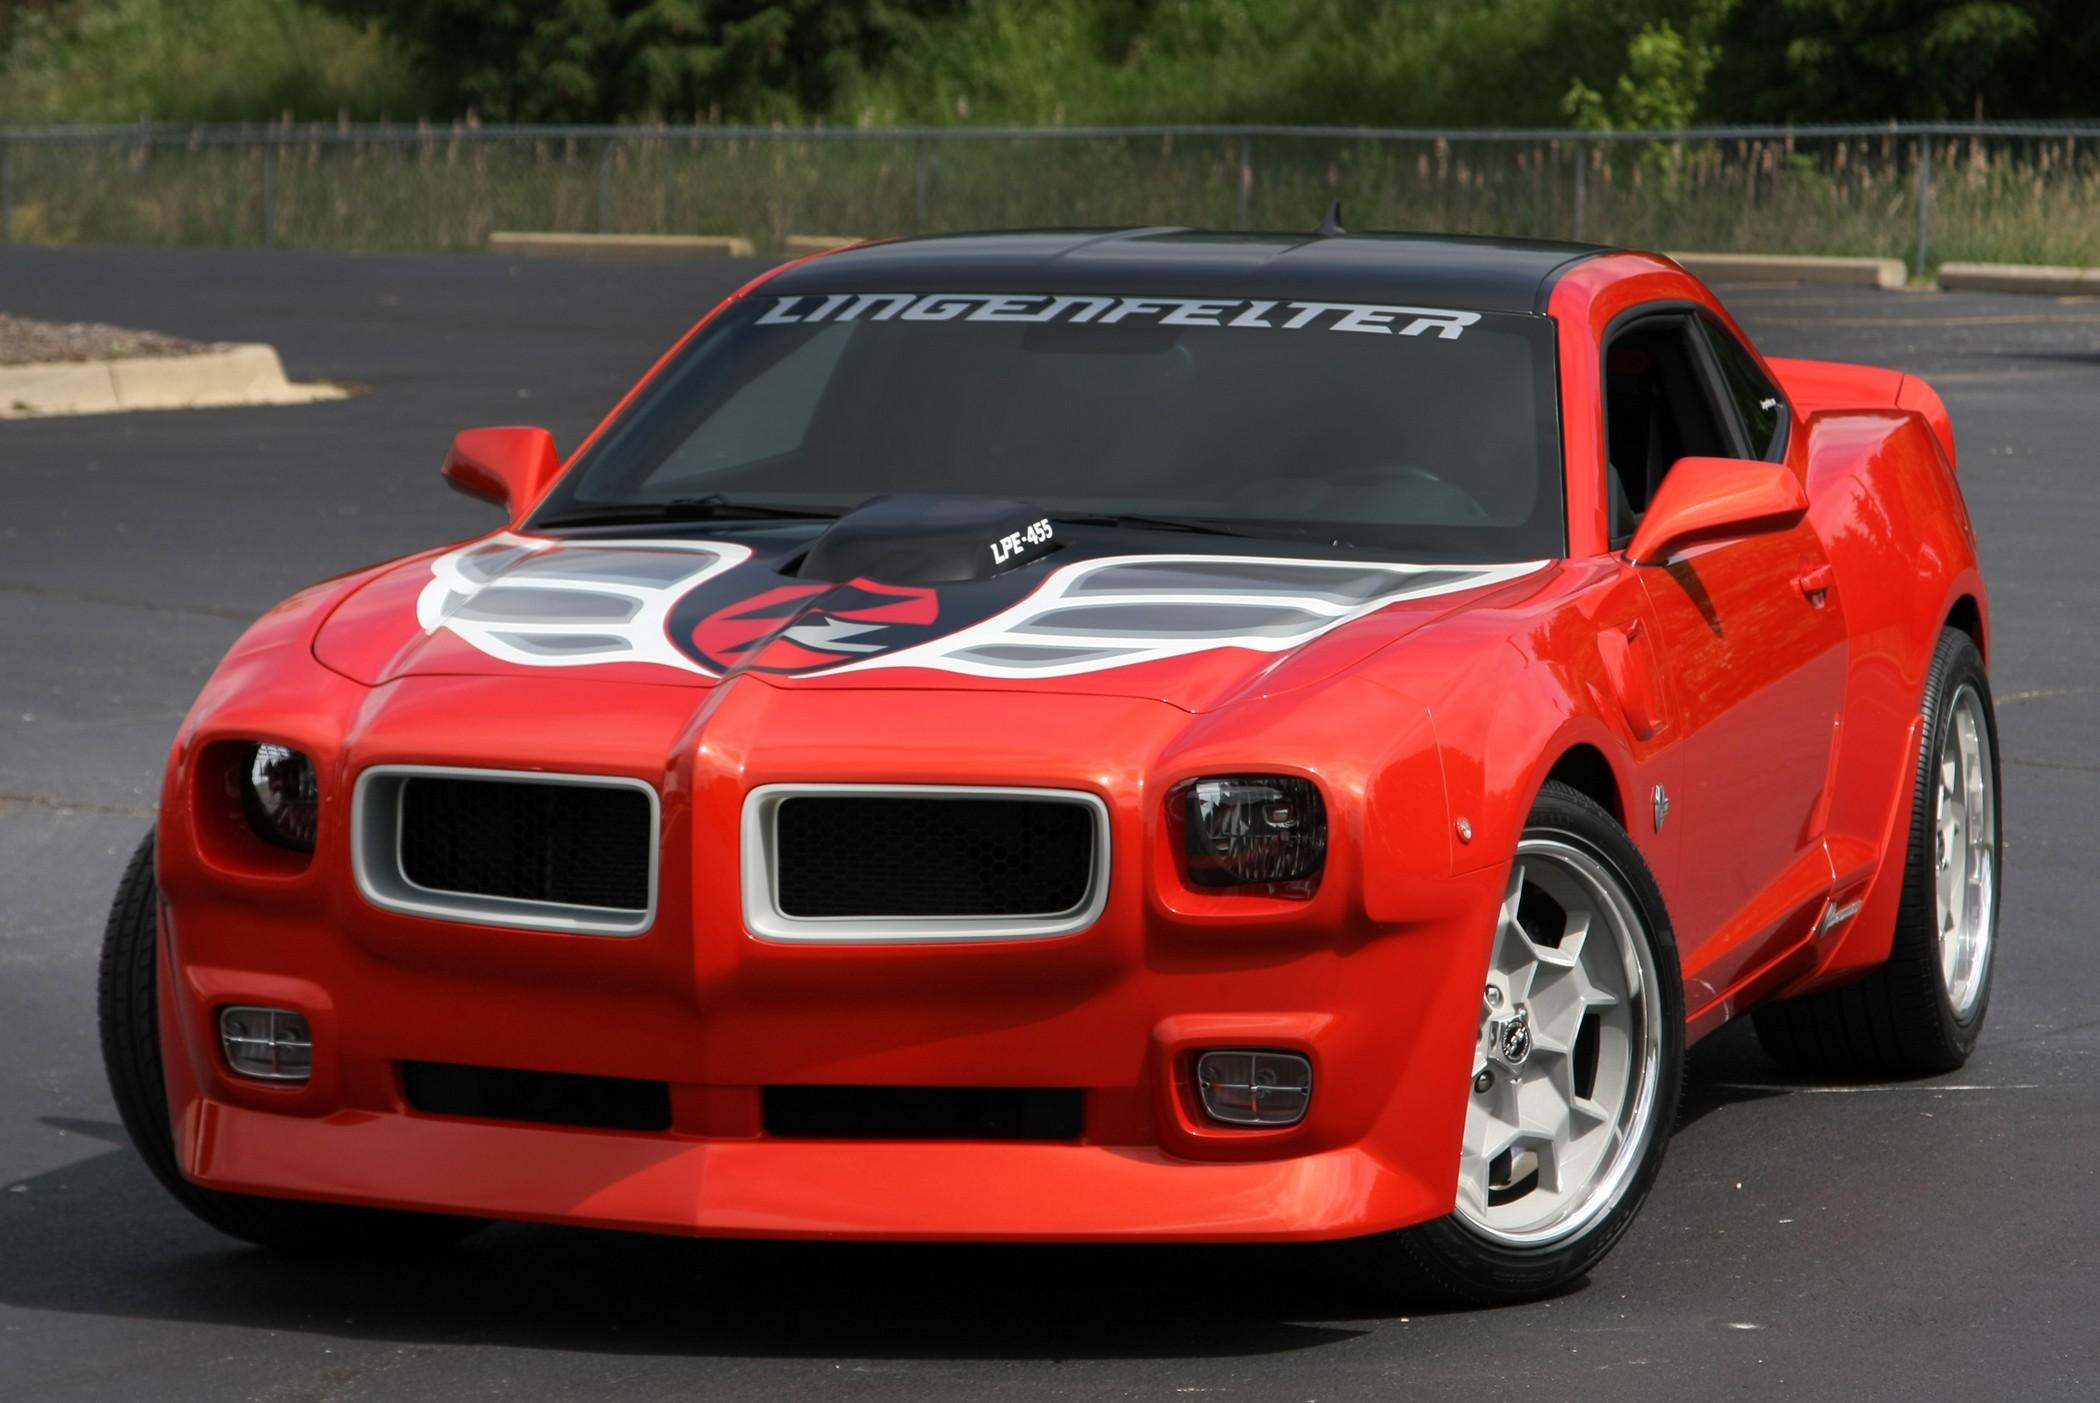 LINGENFELTER 2010 LTA CAMARO CONCEPT CAR #6 Full HD ...